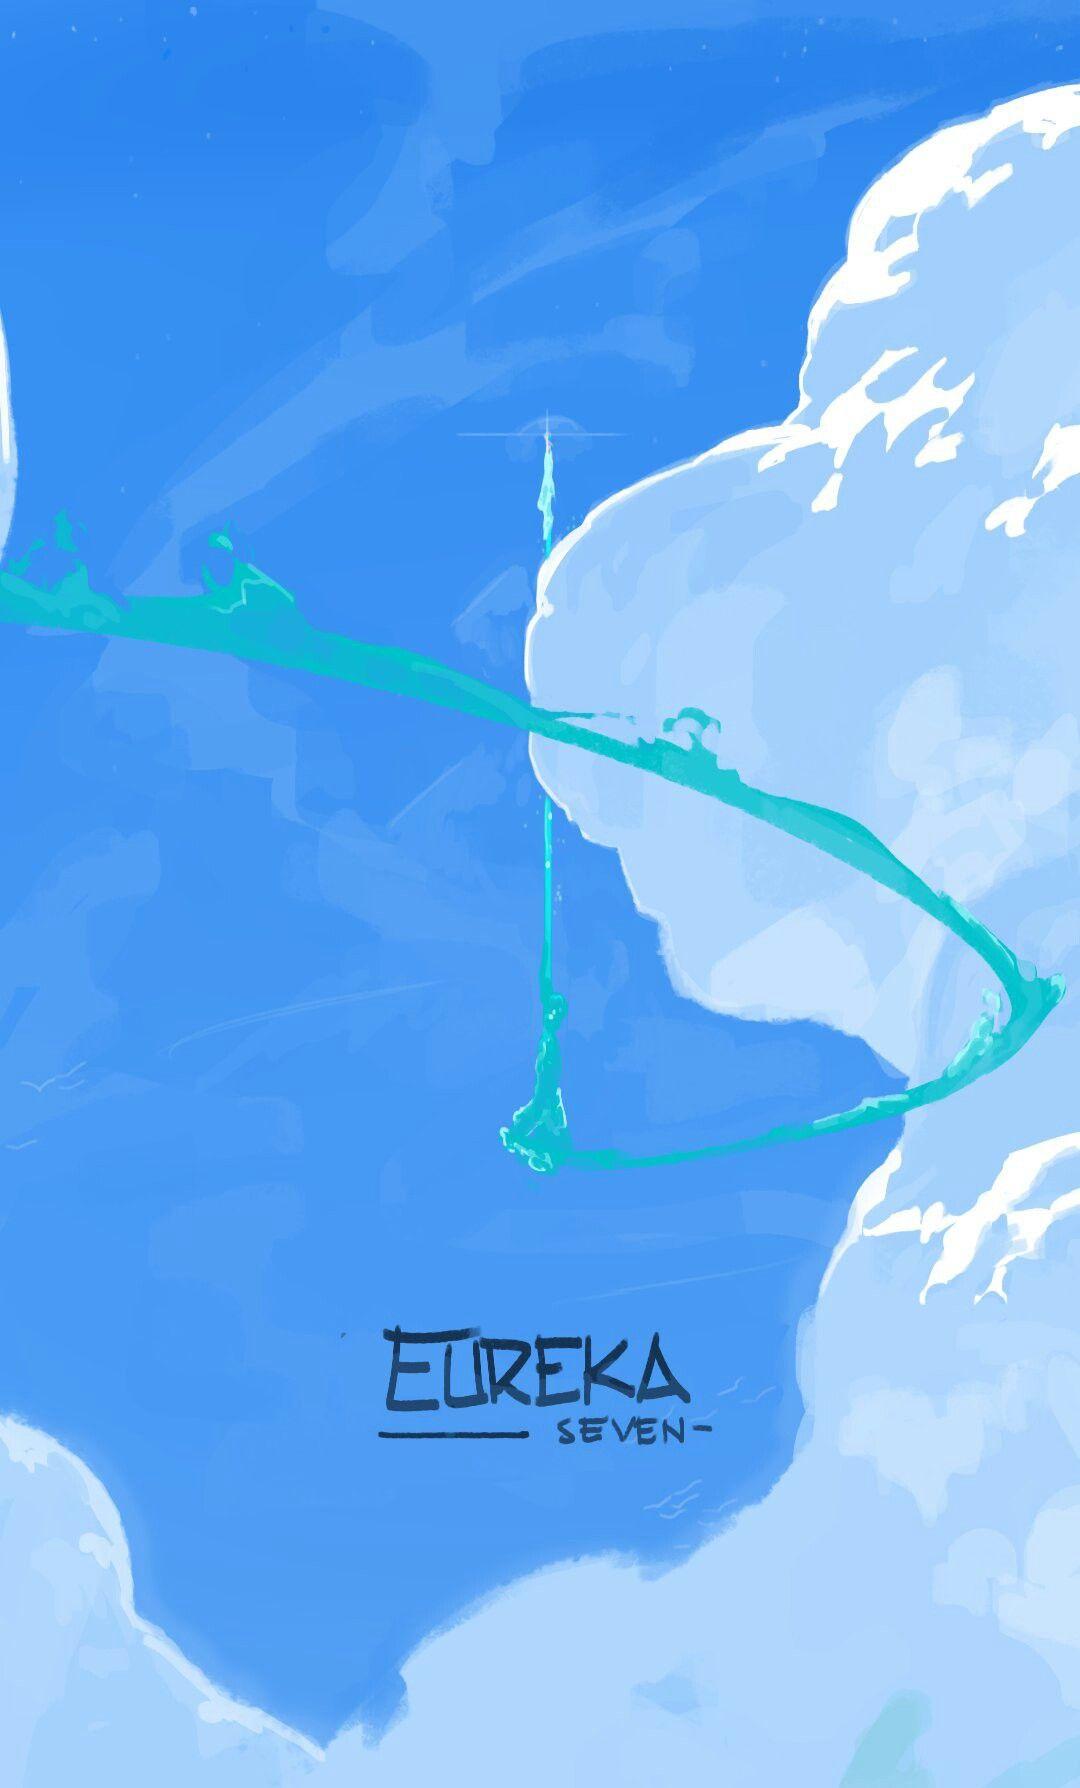 Eureka Seven 交響詩篇エウレカセブン 詩篇 交響詩編エウレカセブン